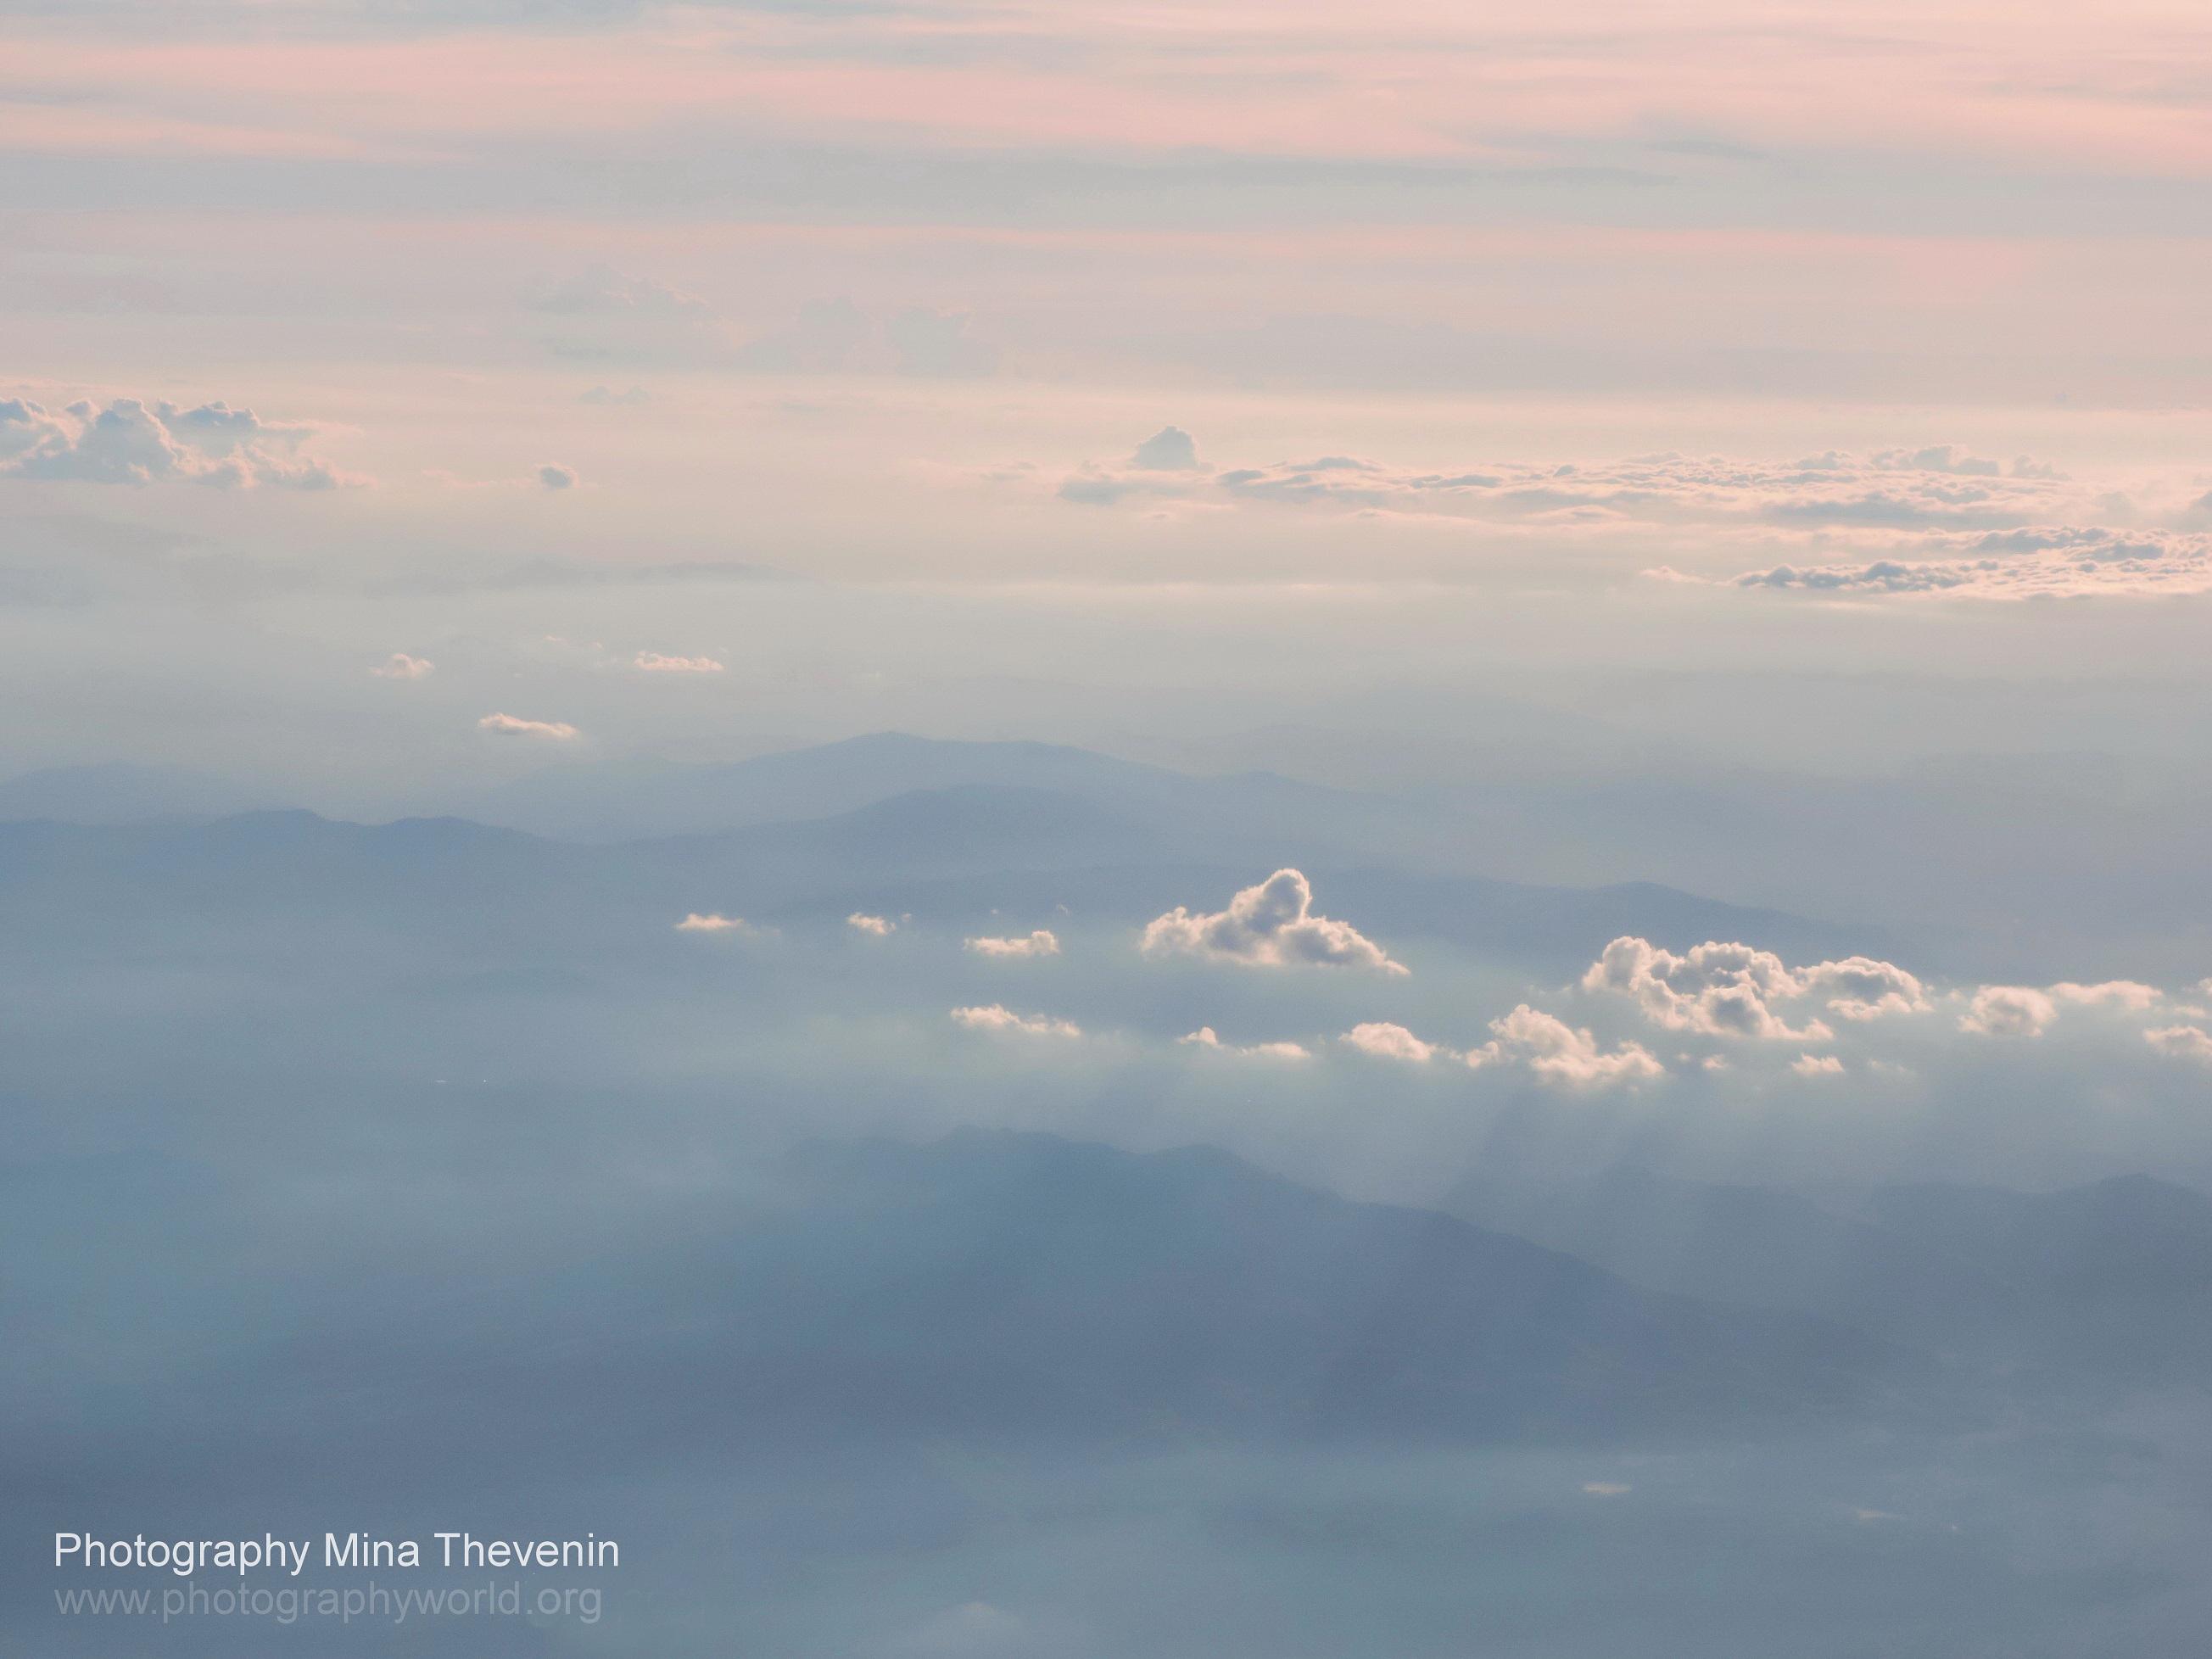 "© Appalachian Range in Clouds at Sunset. Photograph by Mina Thevenin. Photography World article: ""APPALACHIAN TRAIL|Take a Walk on the Wild Side|Nantahala|Tellico Gap to Wayah Bald"" photographyworld.org"